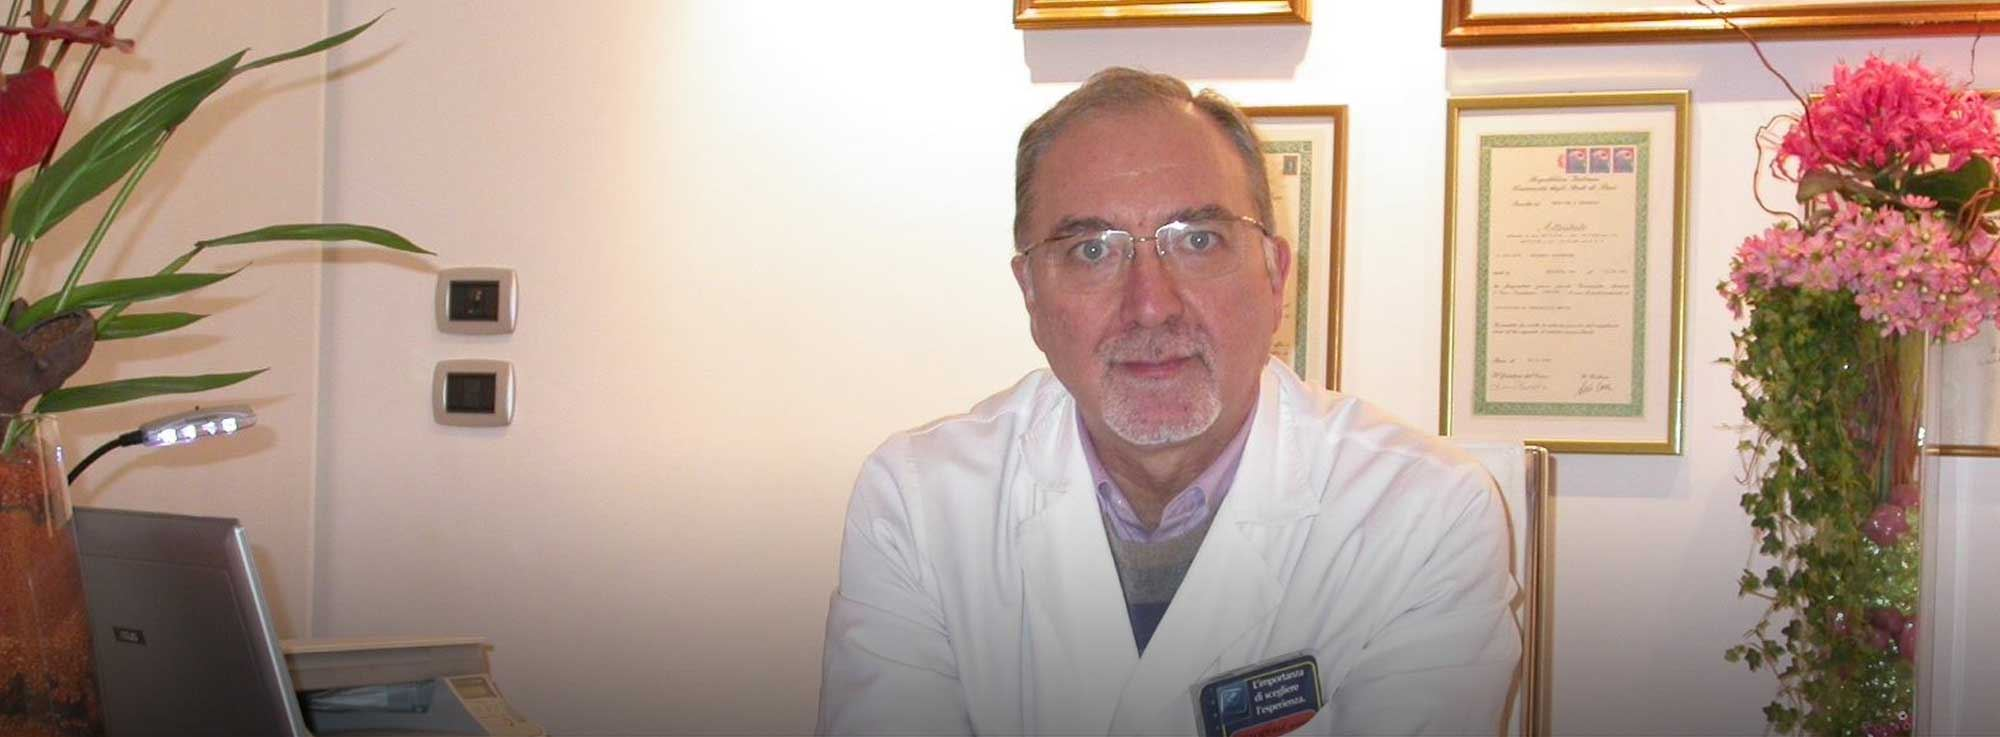 Dott. Costantino Frisario Barletta